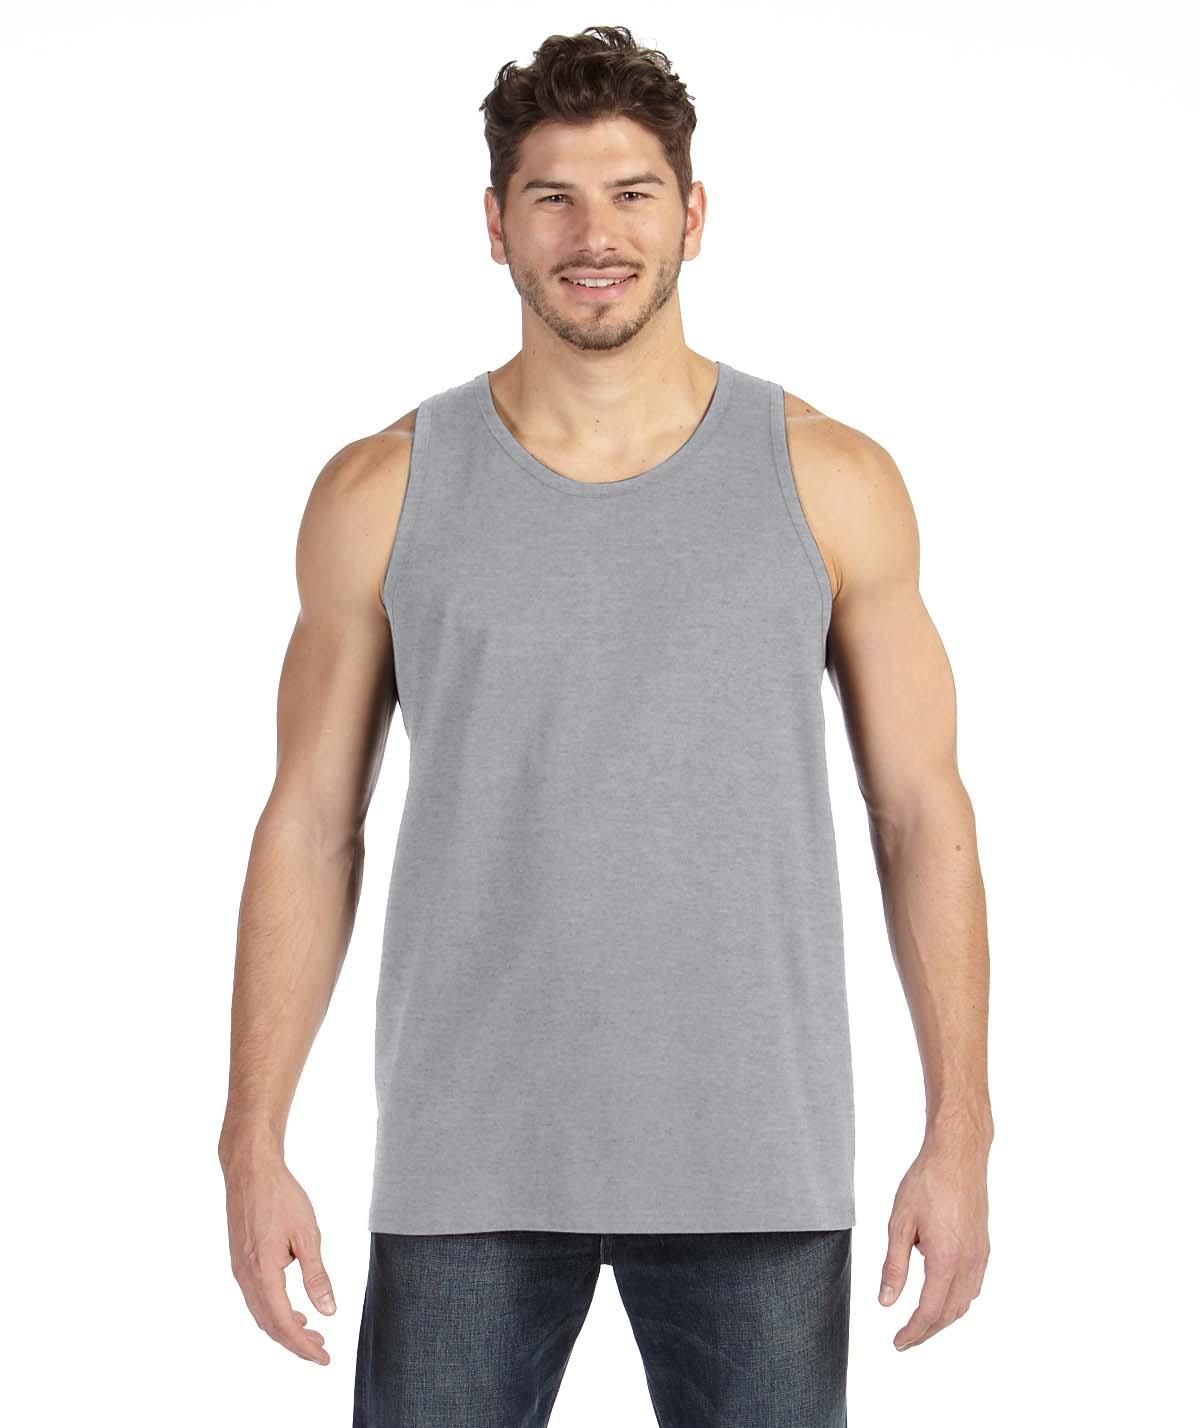 New 36 pc wholesale case anvil tank top unisex ringspun for 100 ringspun cotton t shirt wholesale